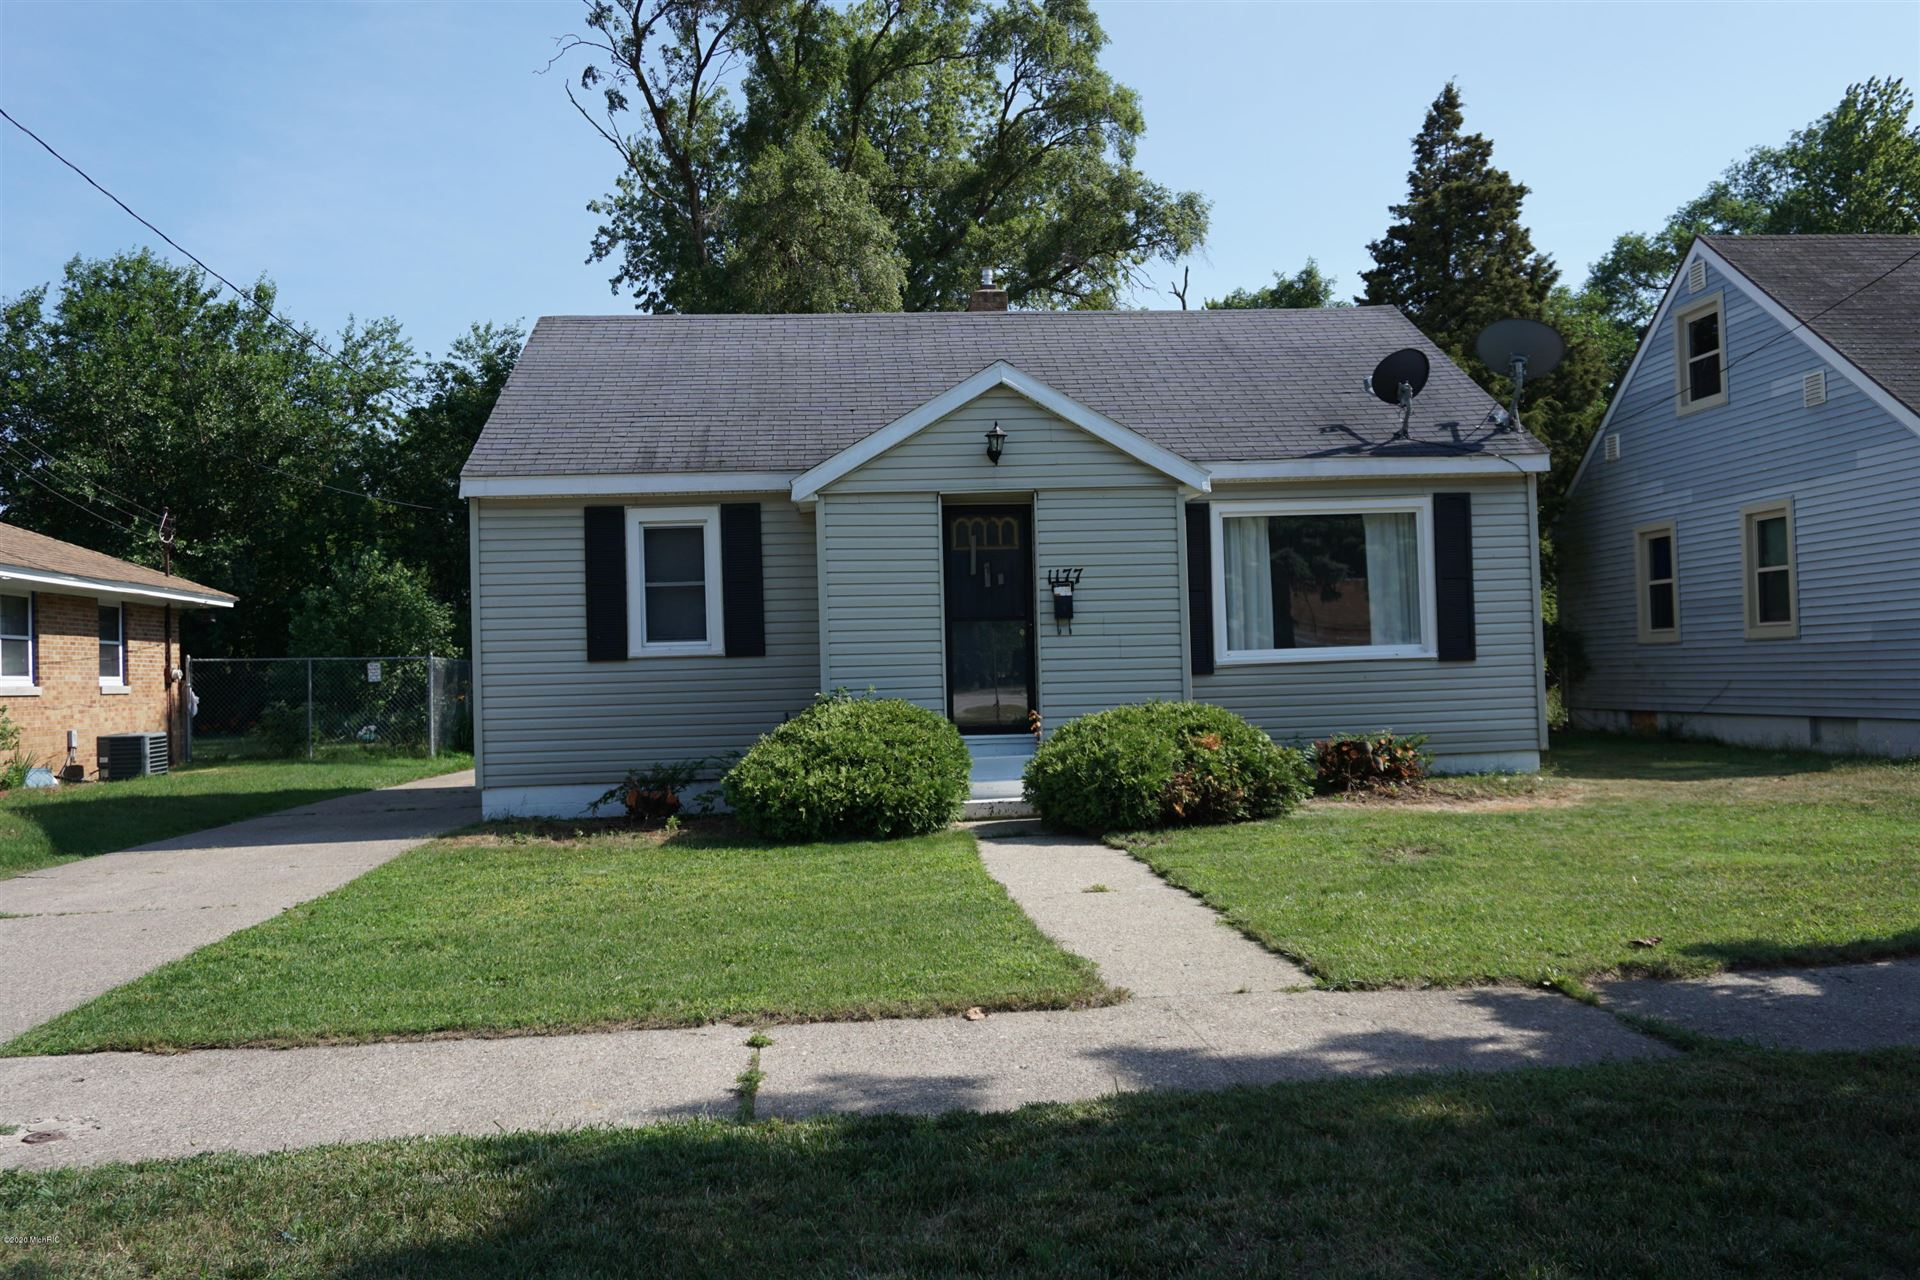 Photo of 1177 Amity Avenue, Muskegon, MI 49442 (MLS # 20024997)